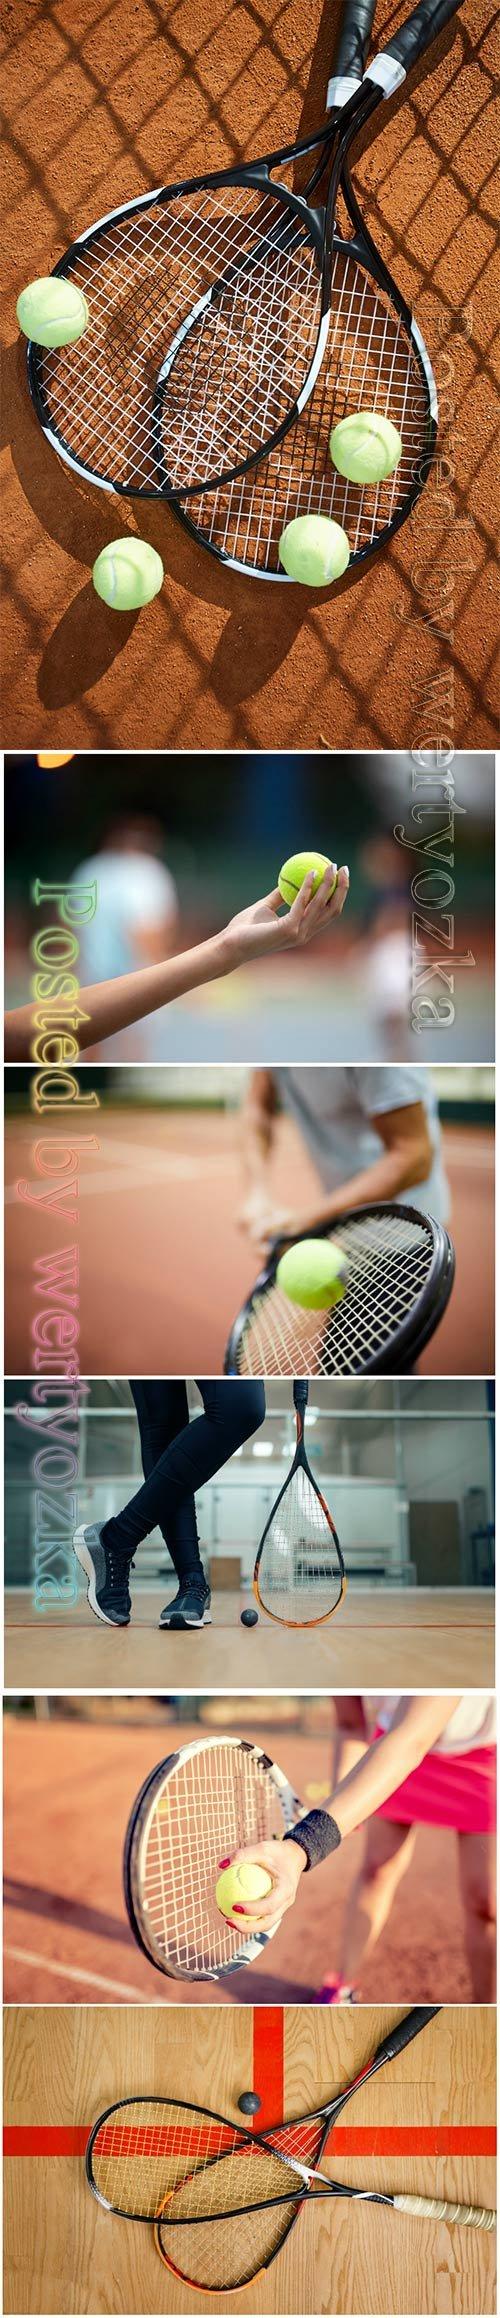 Tennis beautiful stock photo